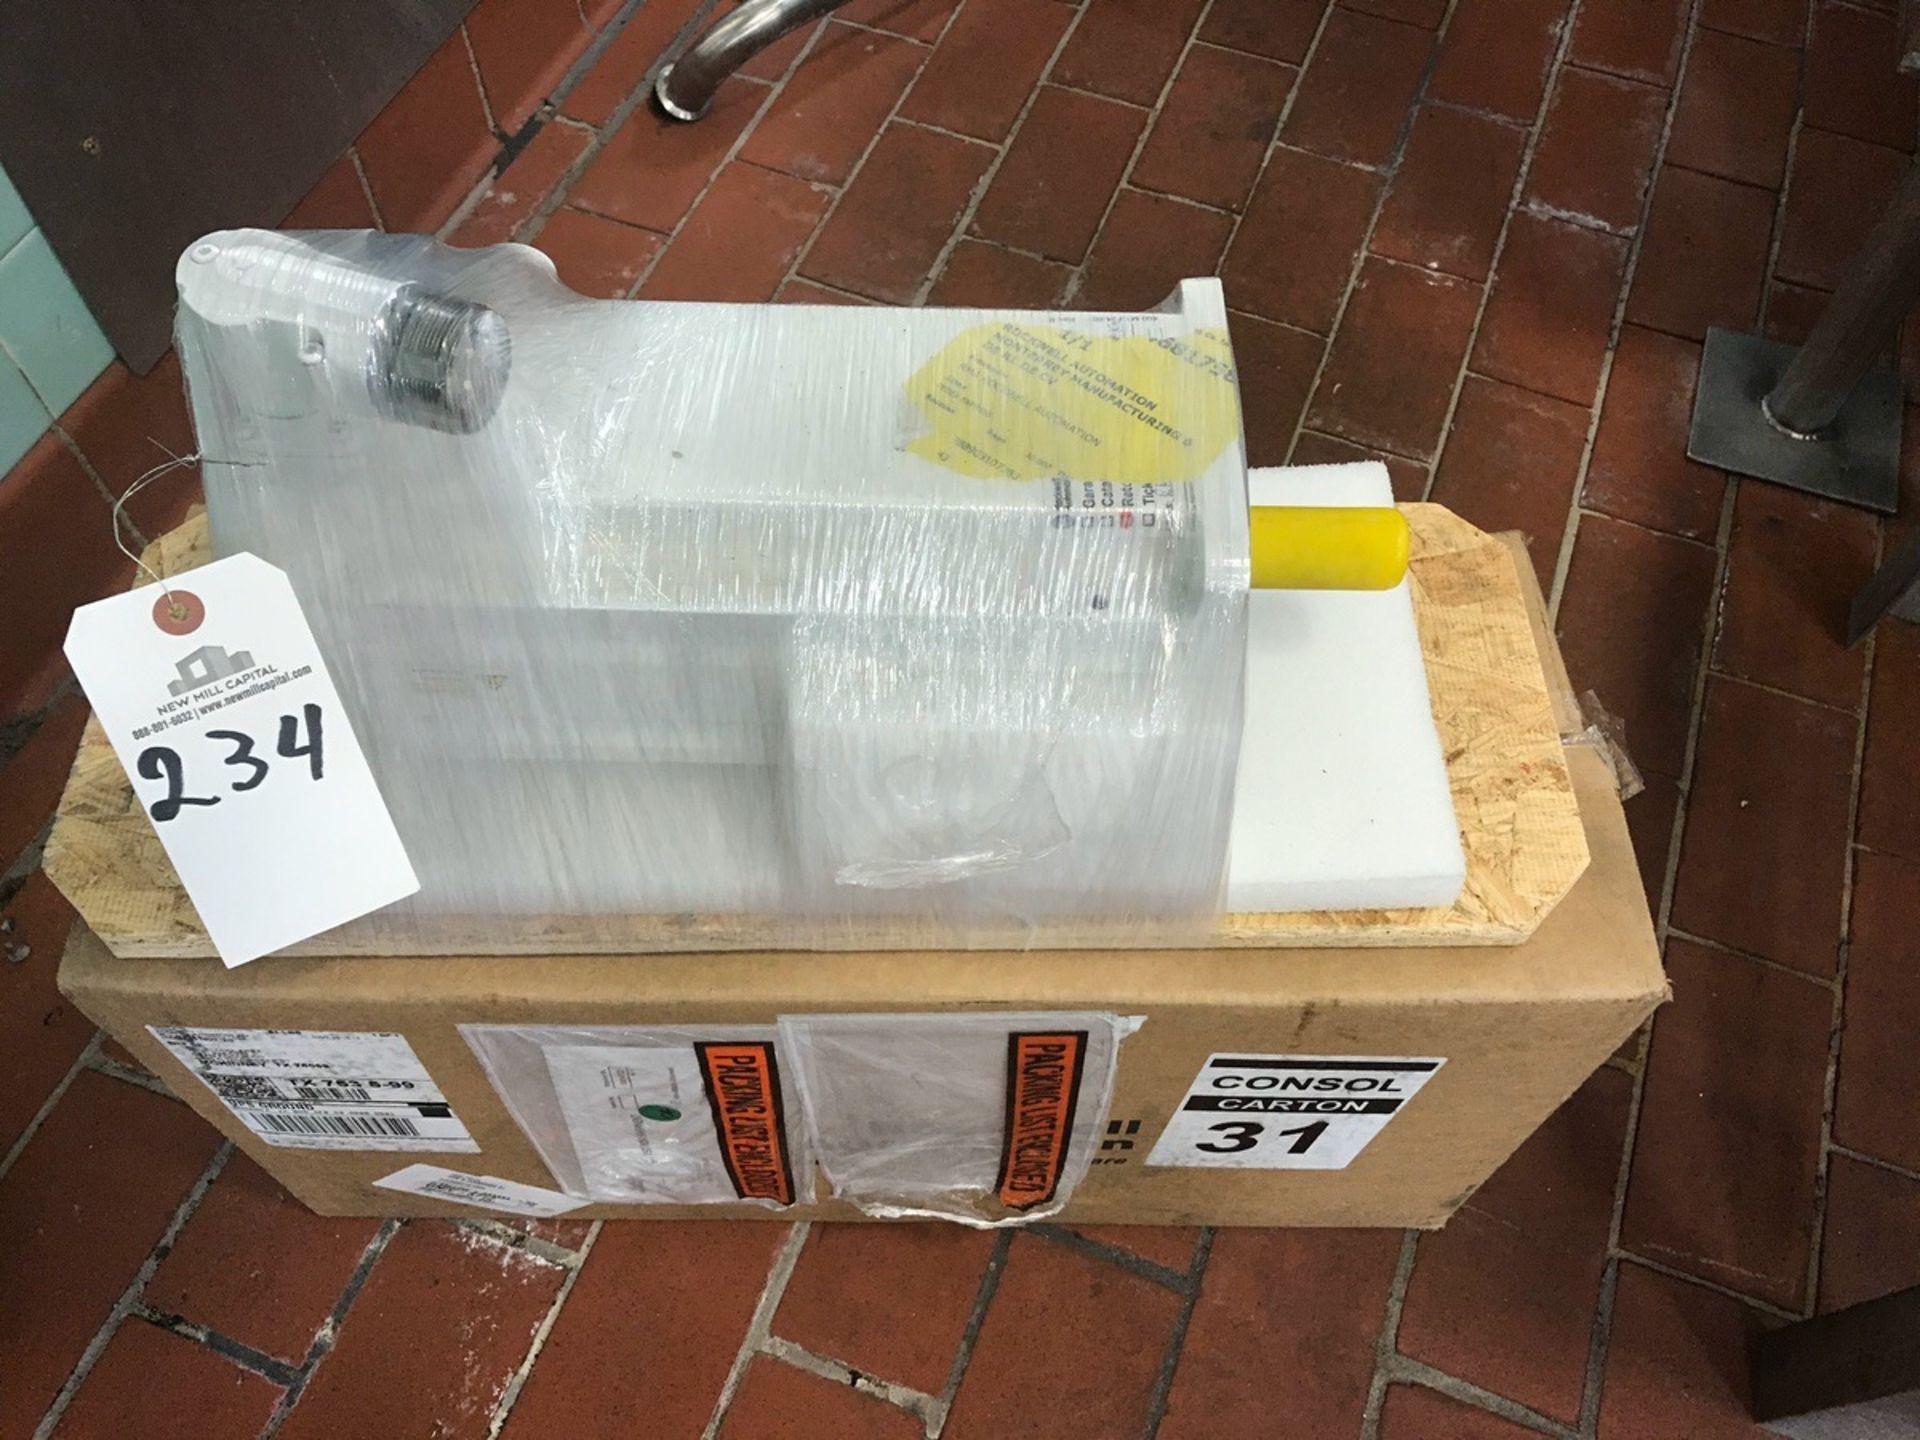 Lot 234 - Rockwell Automation Drive (Unused) | Rig Fee: $50